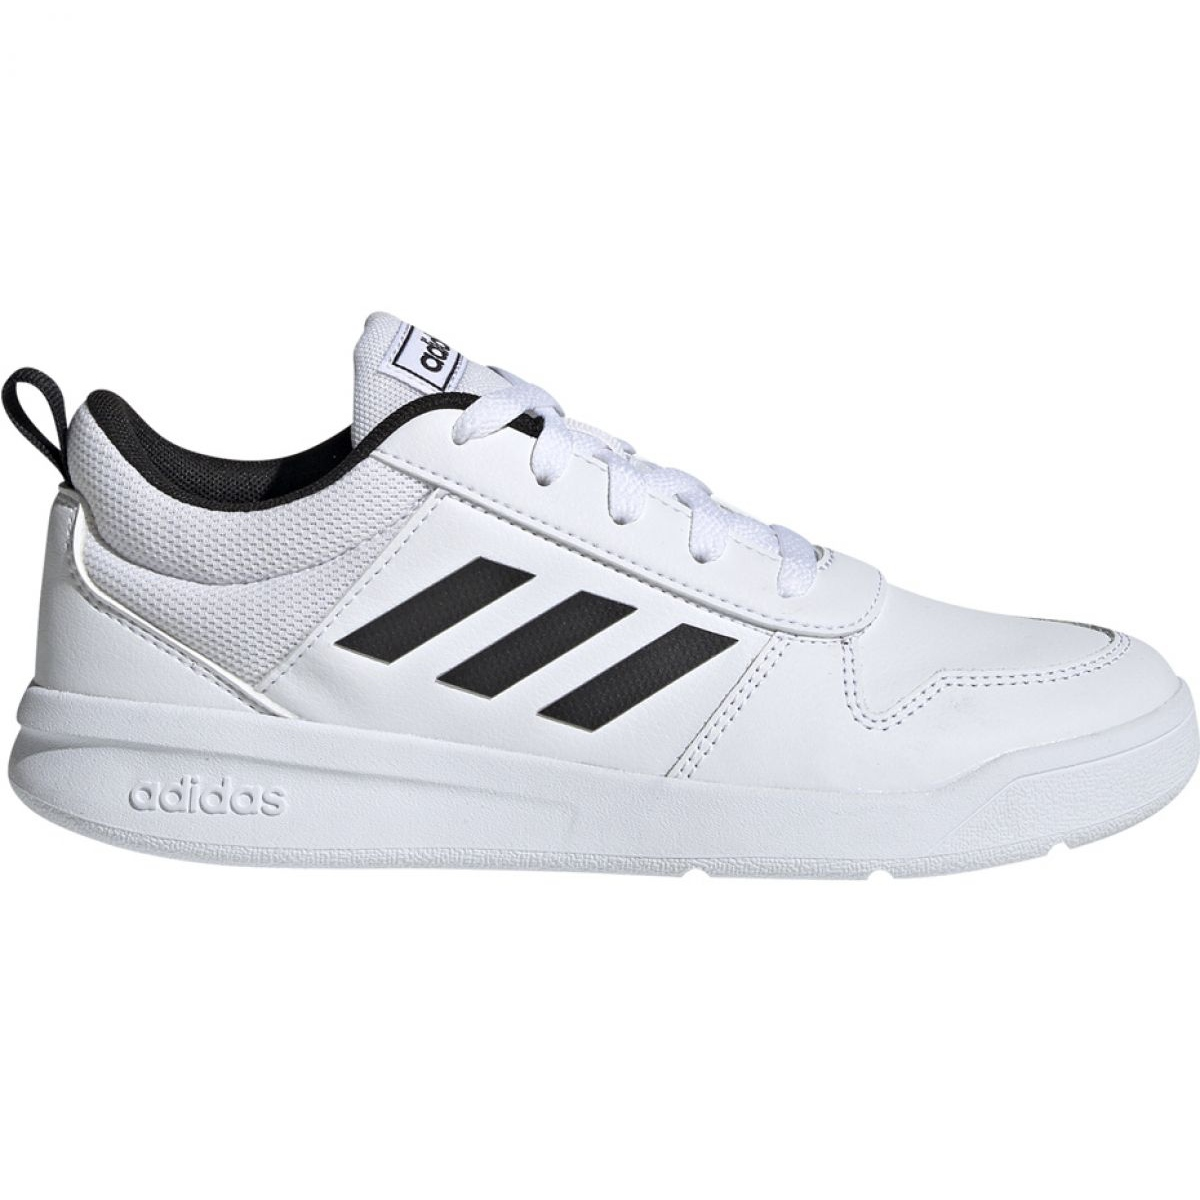 online store 8f32b e599f Bianco Scarpe Adidas Tensaur K Jr. EF1085